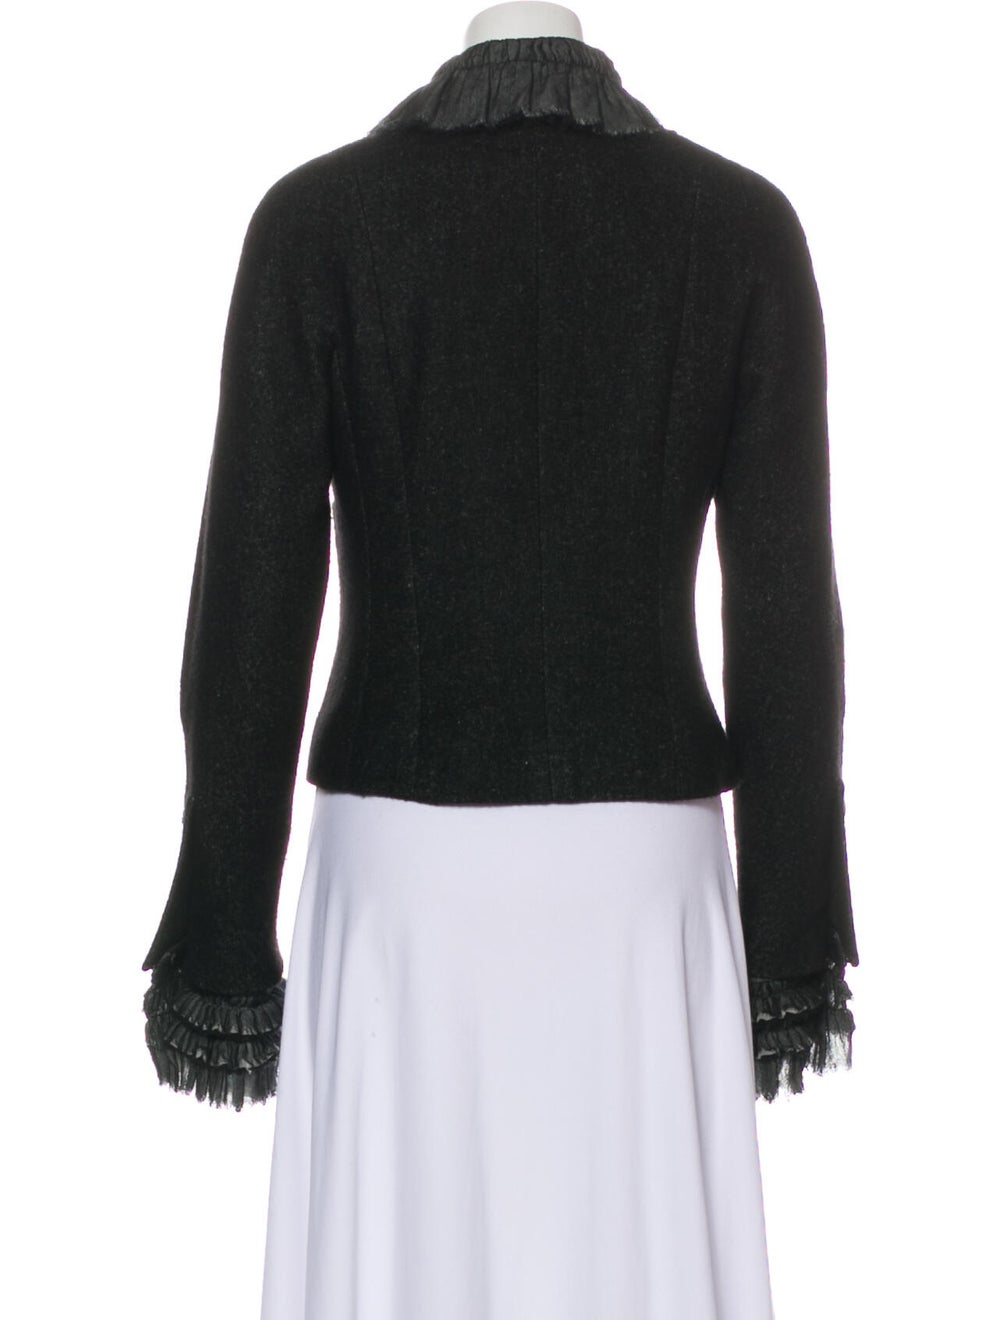 Chanel 2013 Linen Jacket Black - image 3